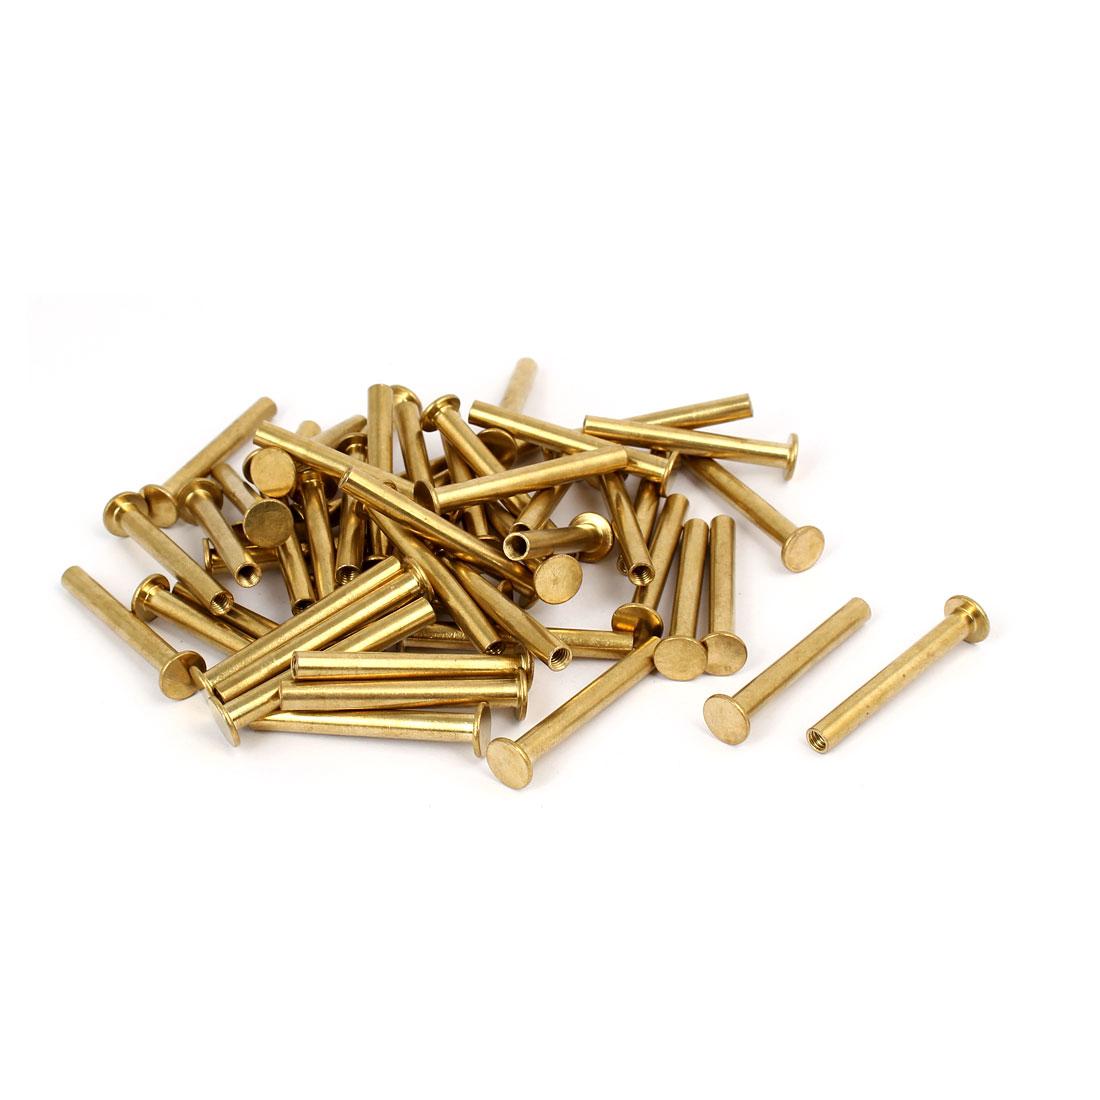 Photo Album Metal Brass Plated Binding Screw Post Barrel Nut 5mmx40mm 50pcs